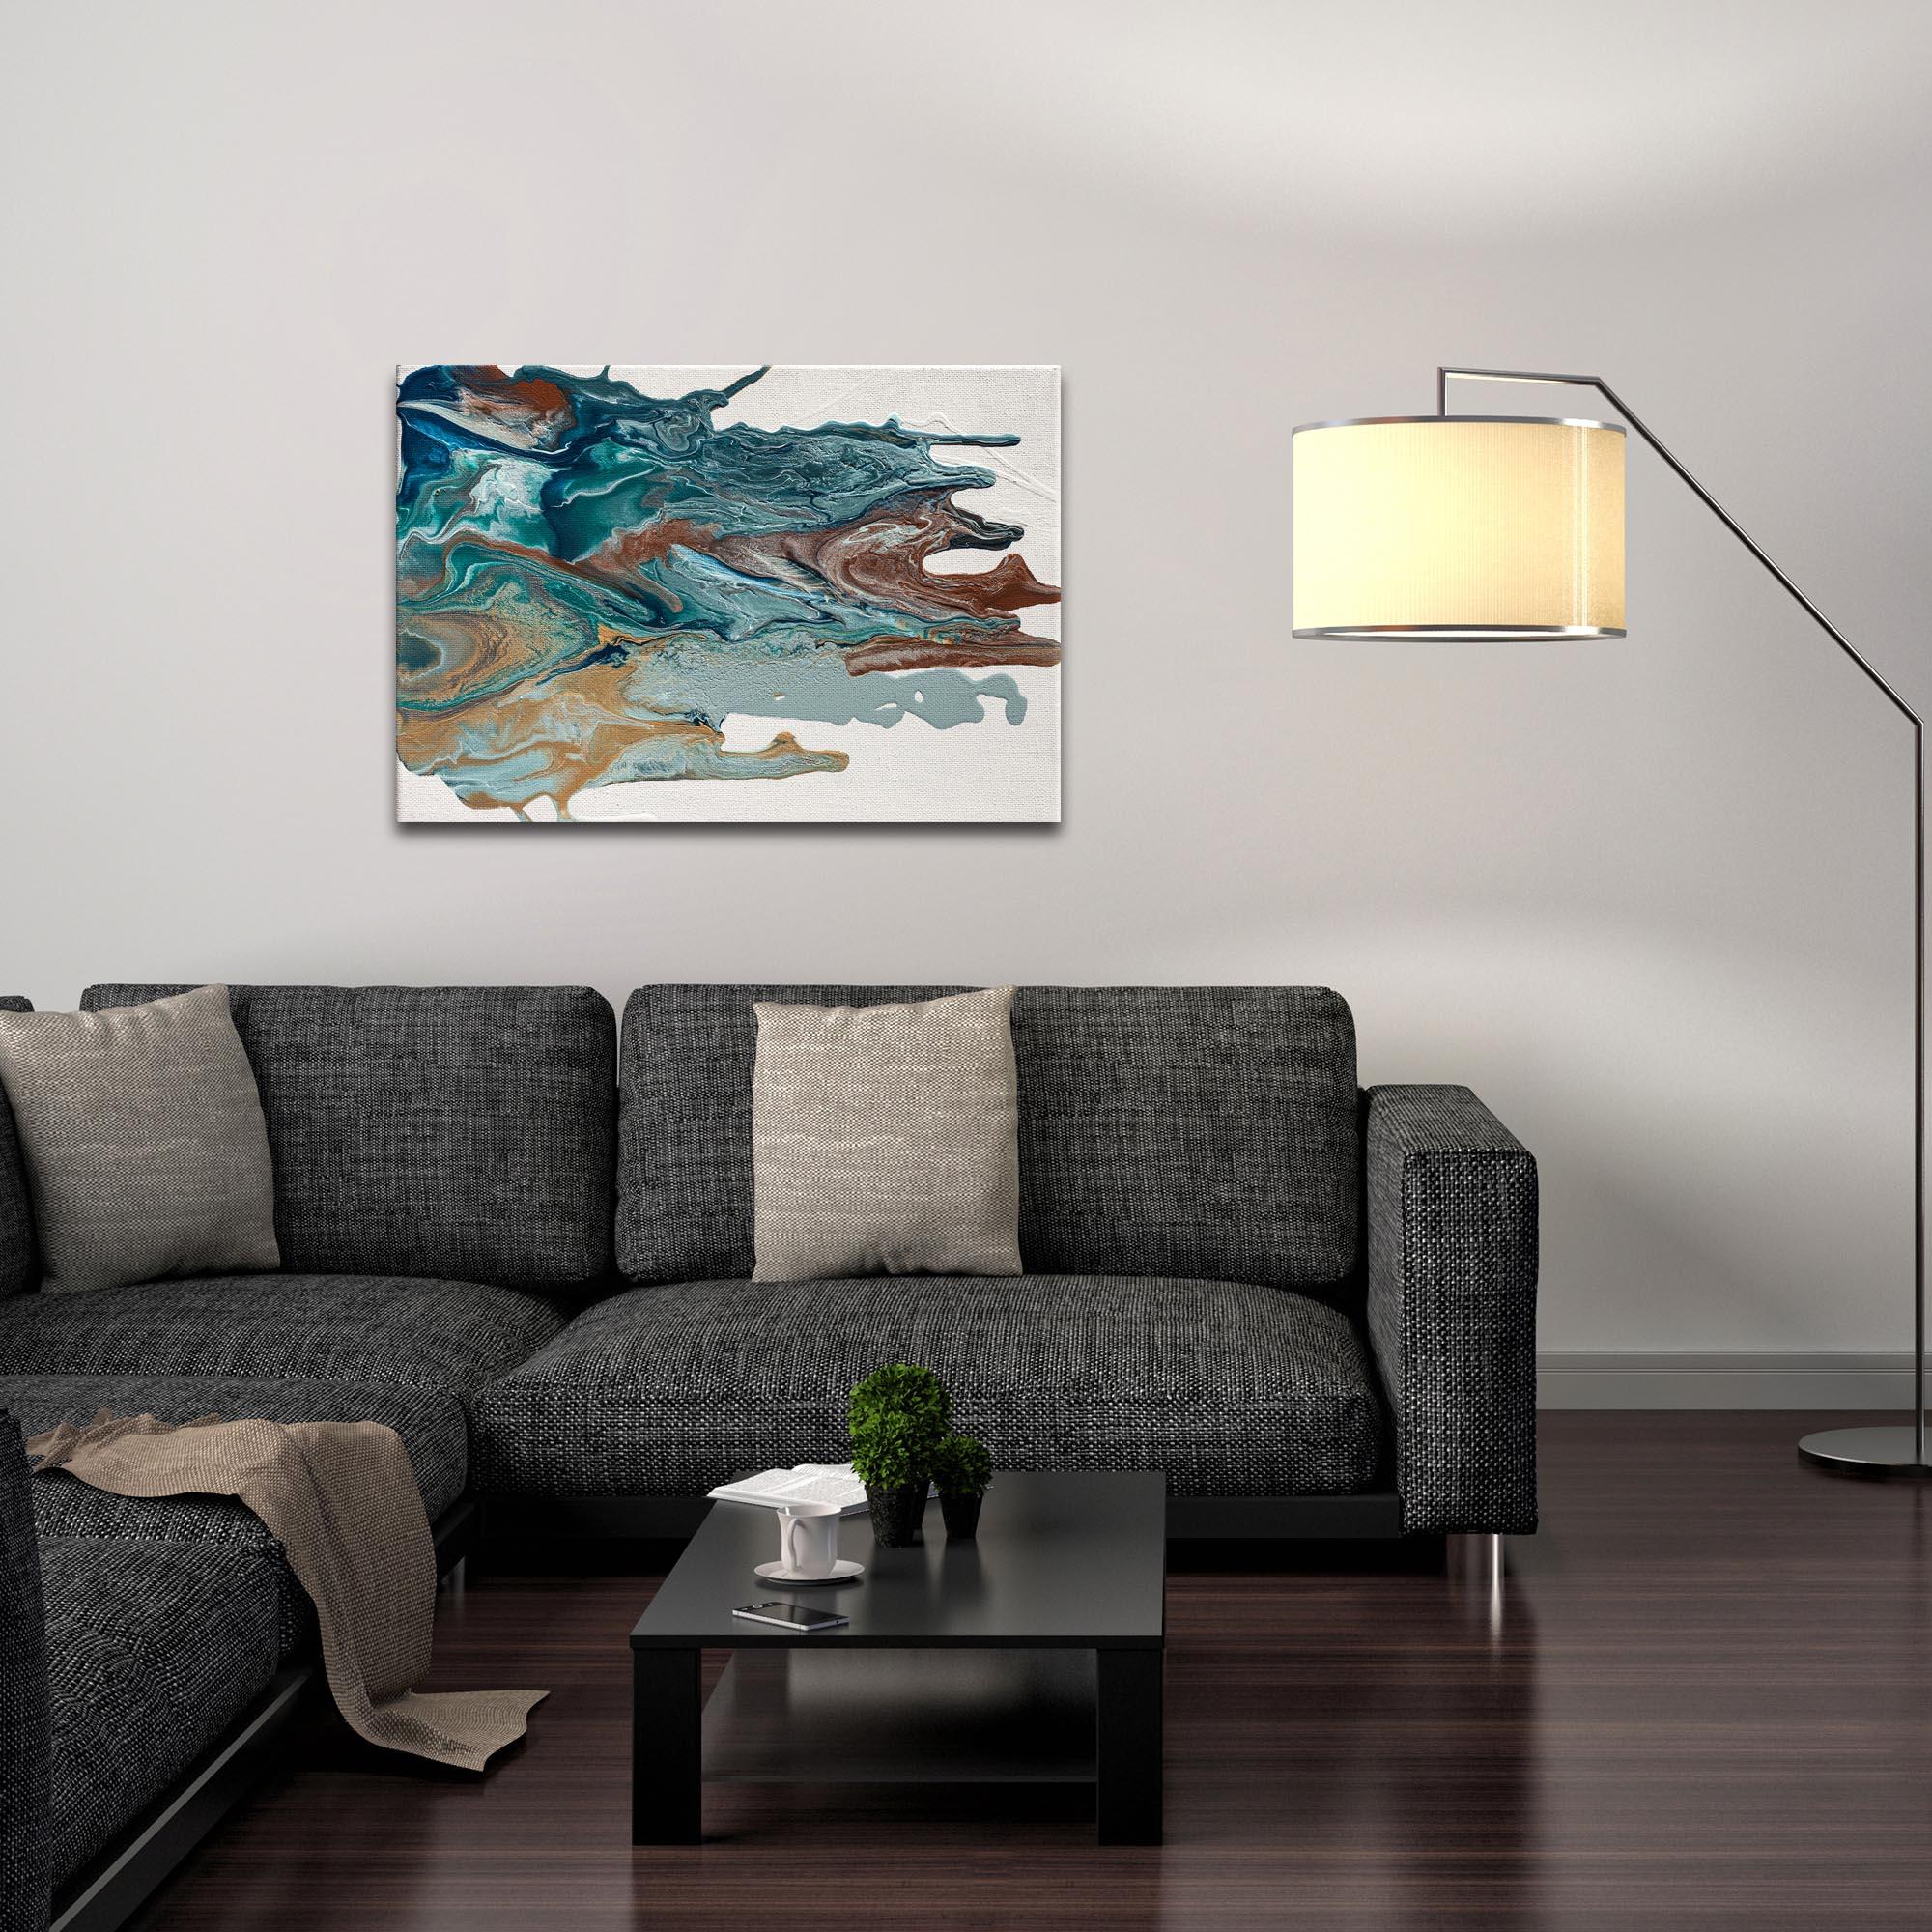 Abstract Wall Art 'Earth 1' - Urban Splatter Decor on Metal or Plexiglass - Lifestyle View